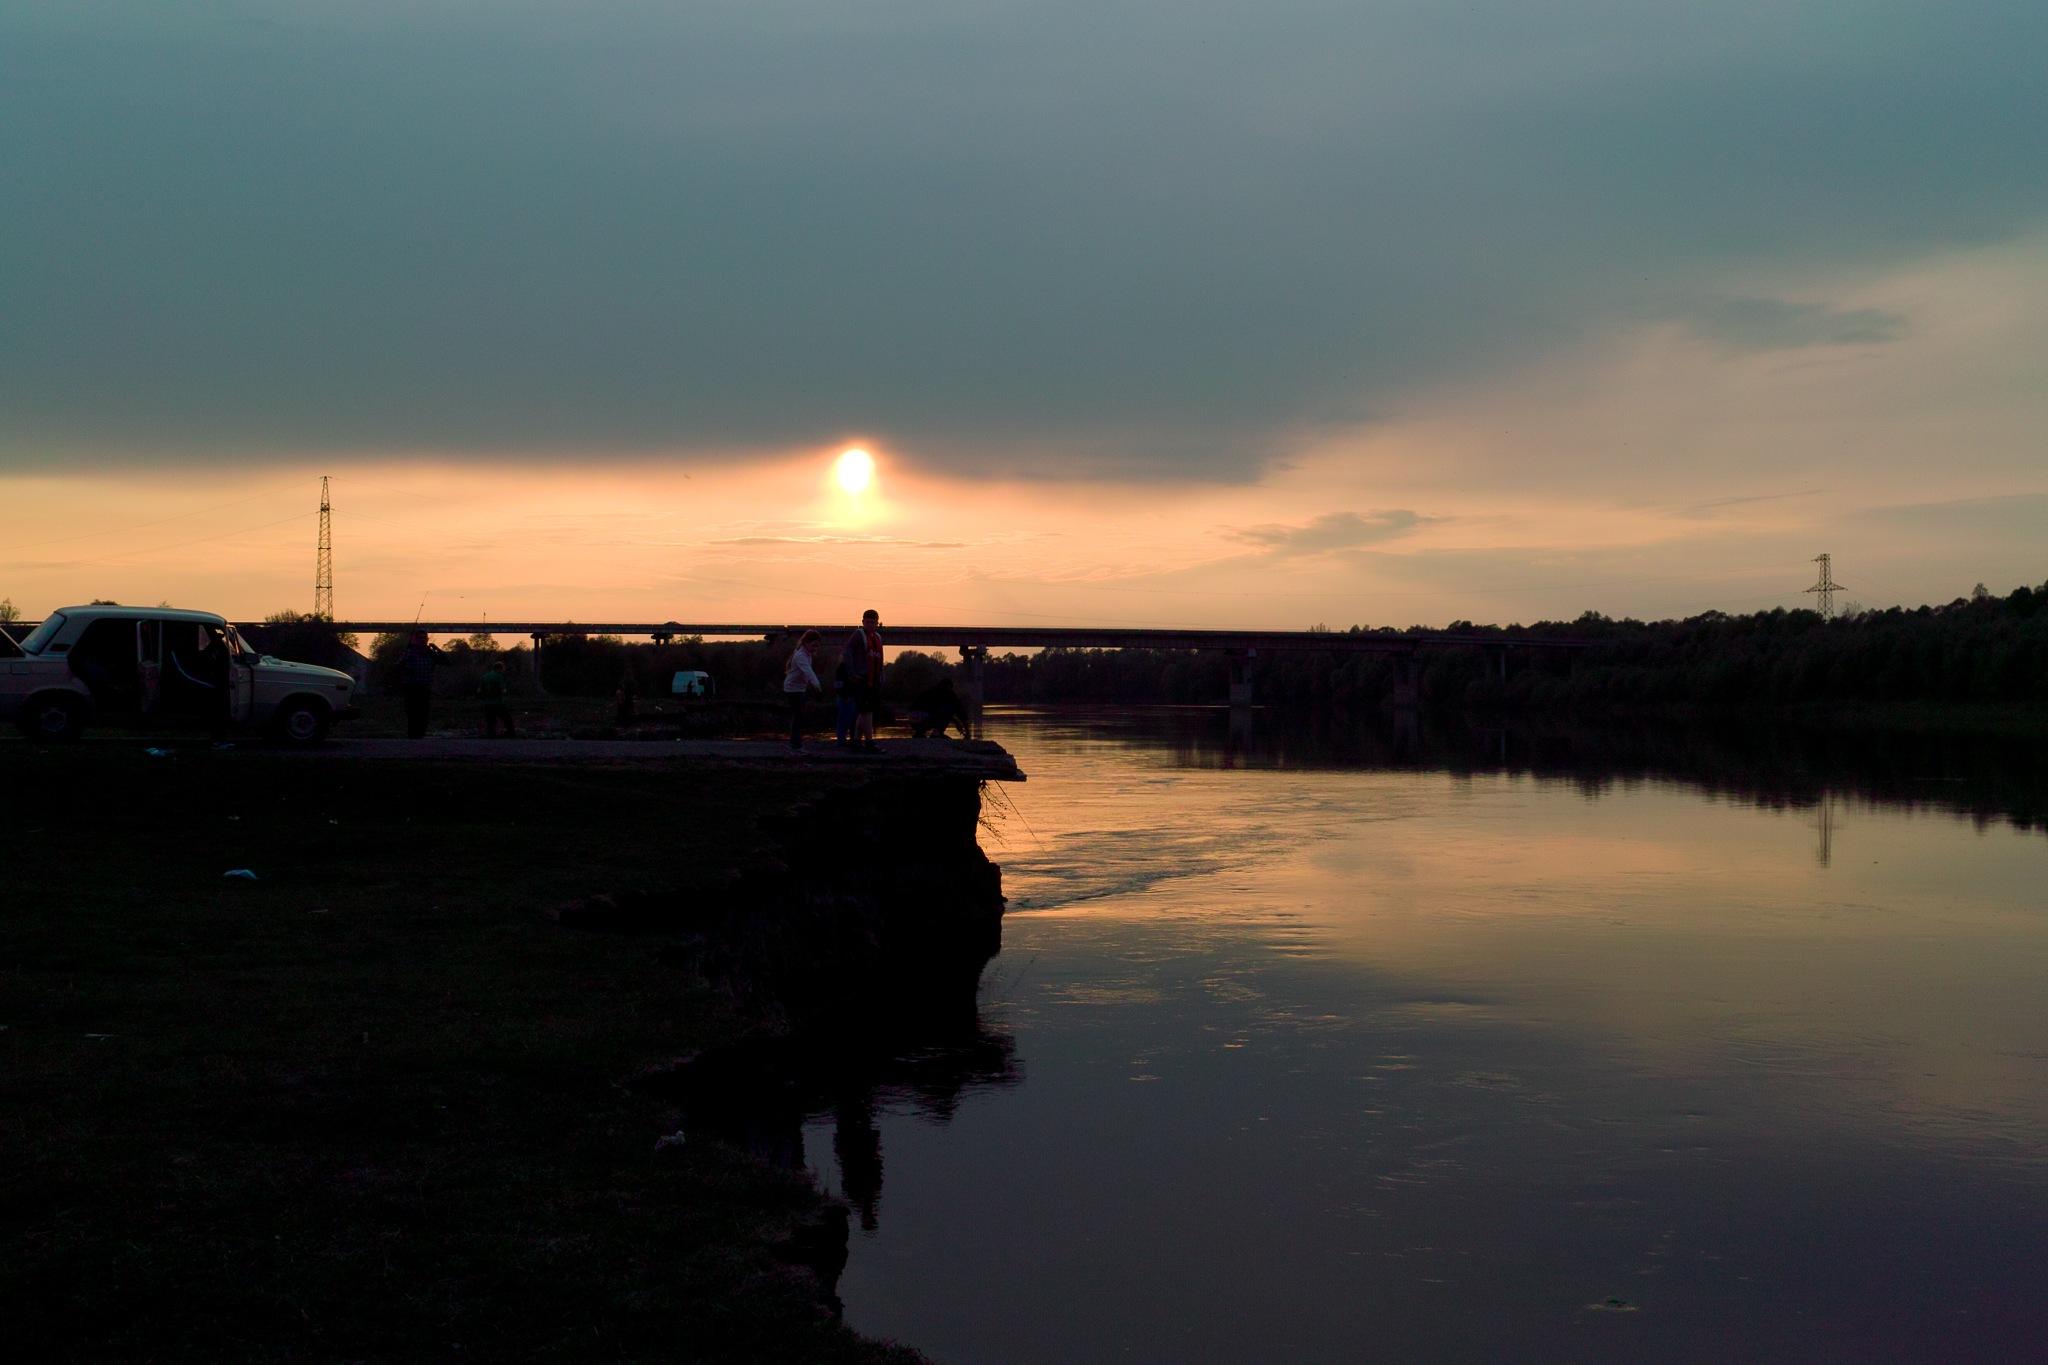 Desna river by DimaShevchuk